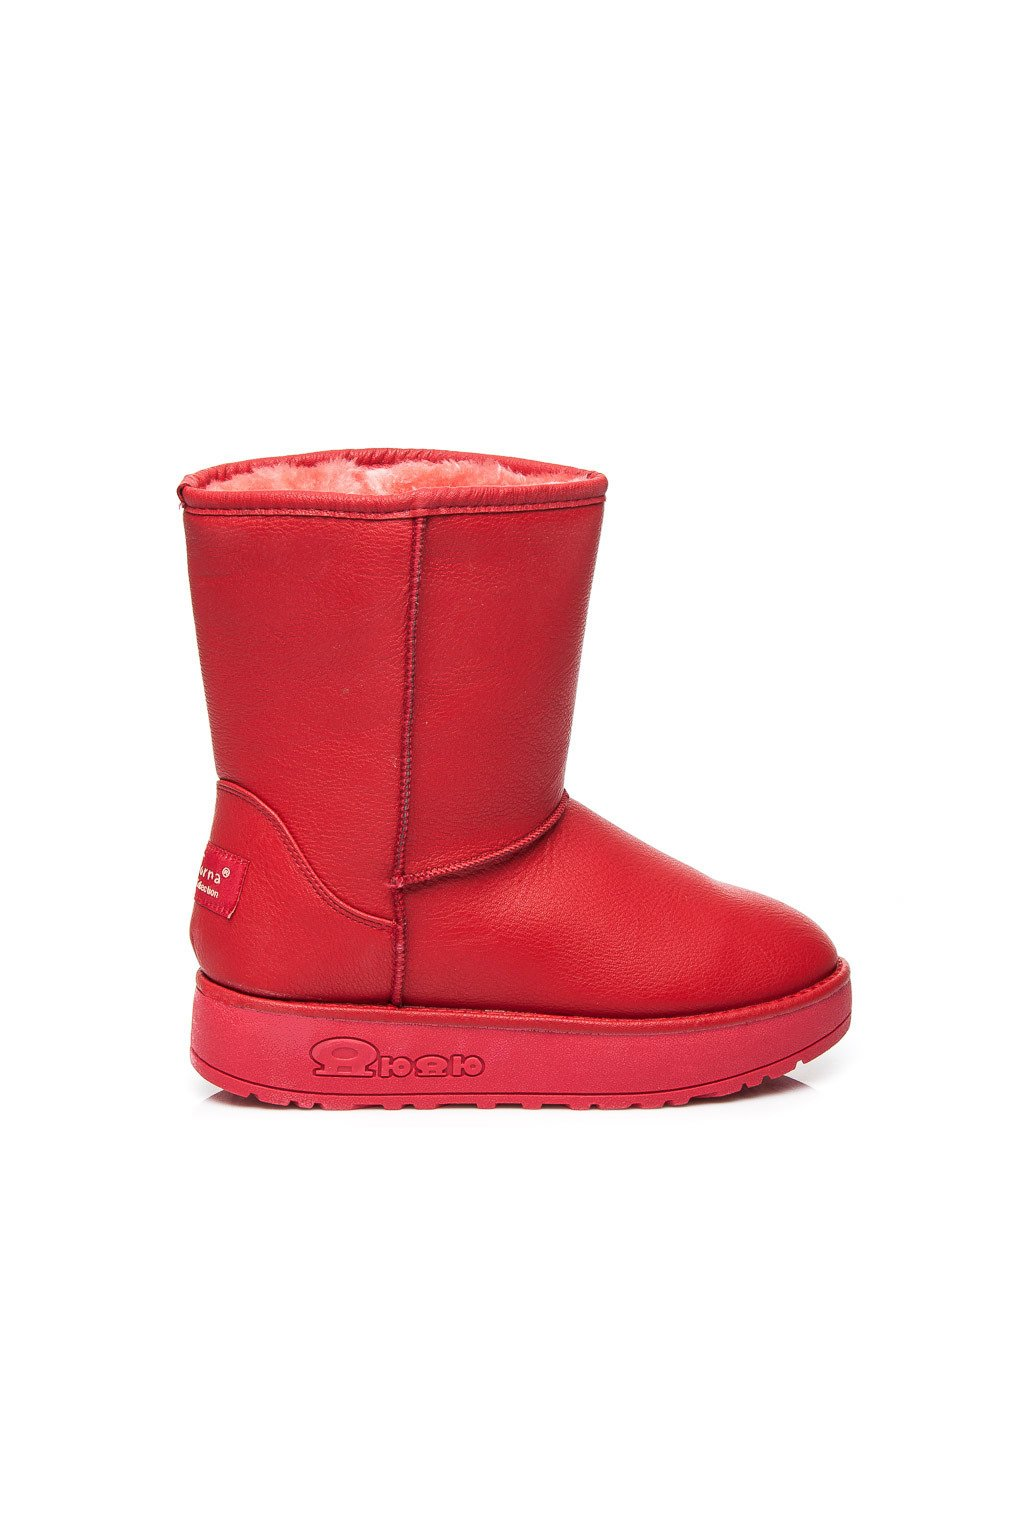 Červené snehule Estera 066R   S3-68P 0a16dd951a8